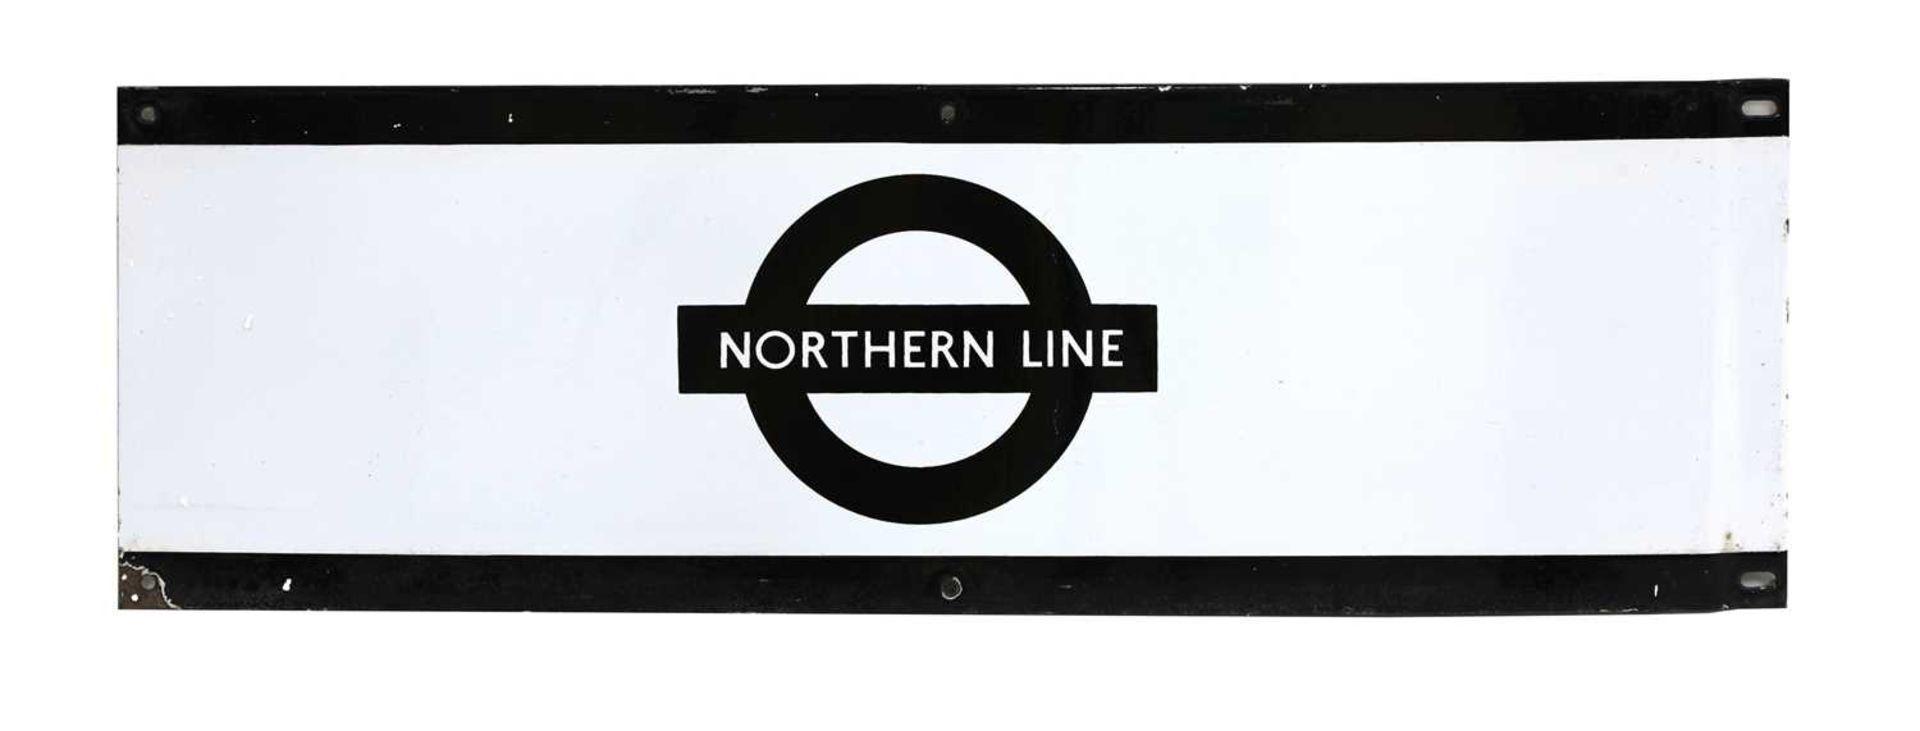 NORTHERN LINE,